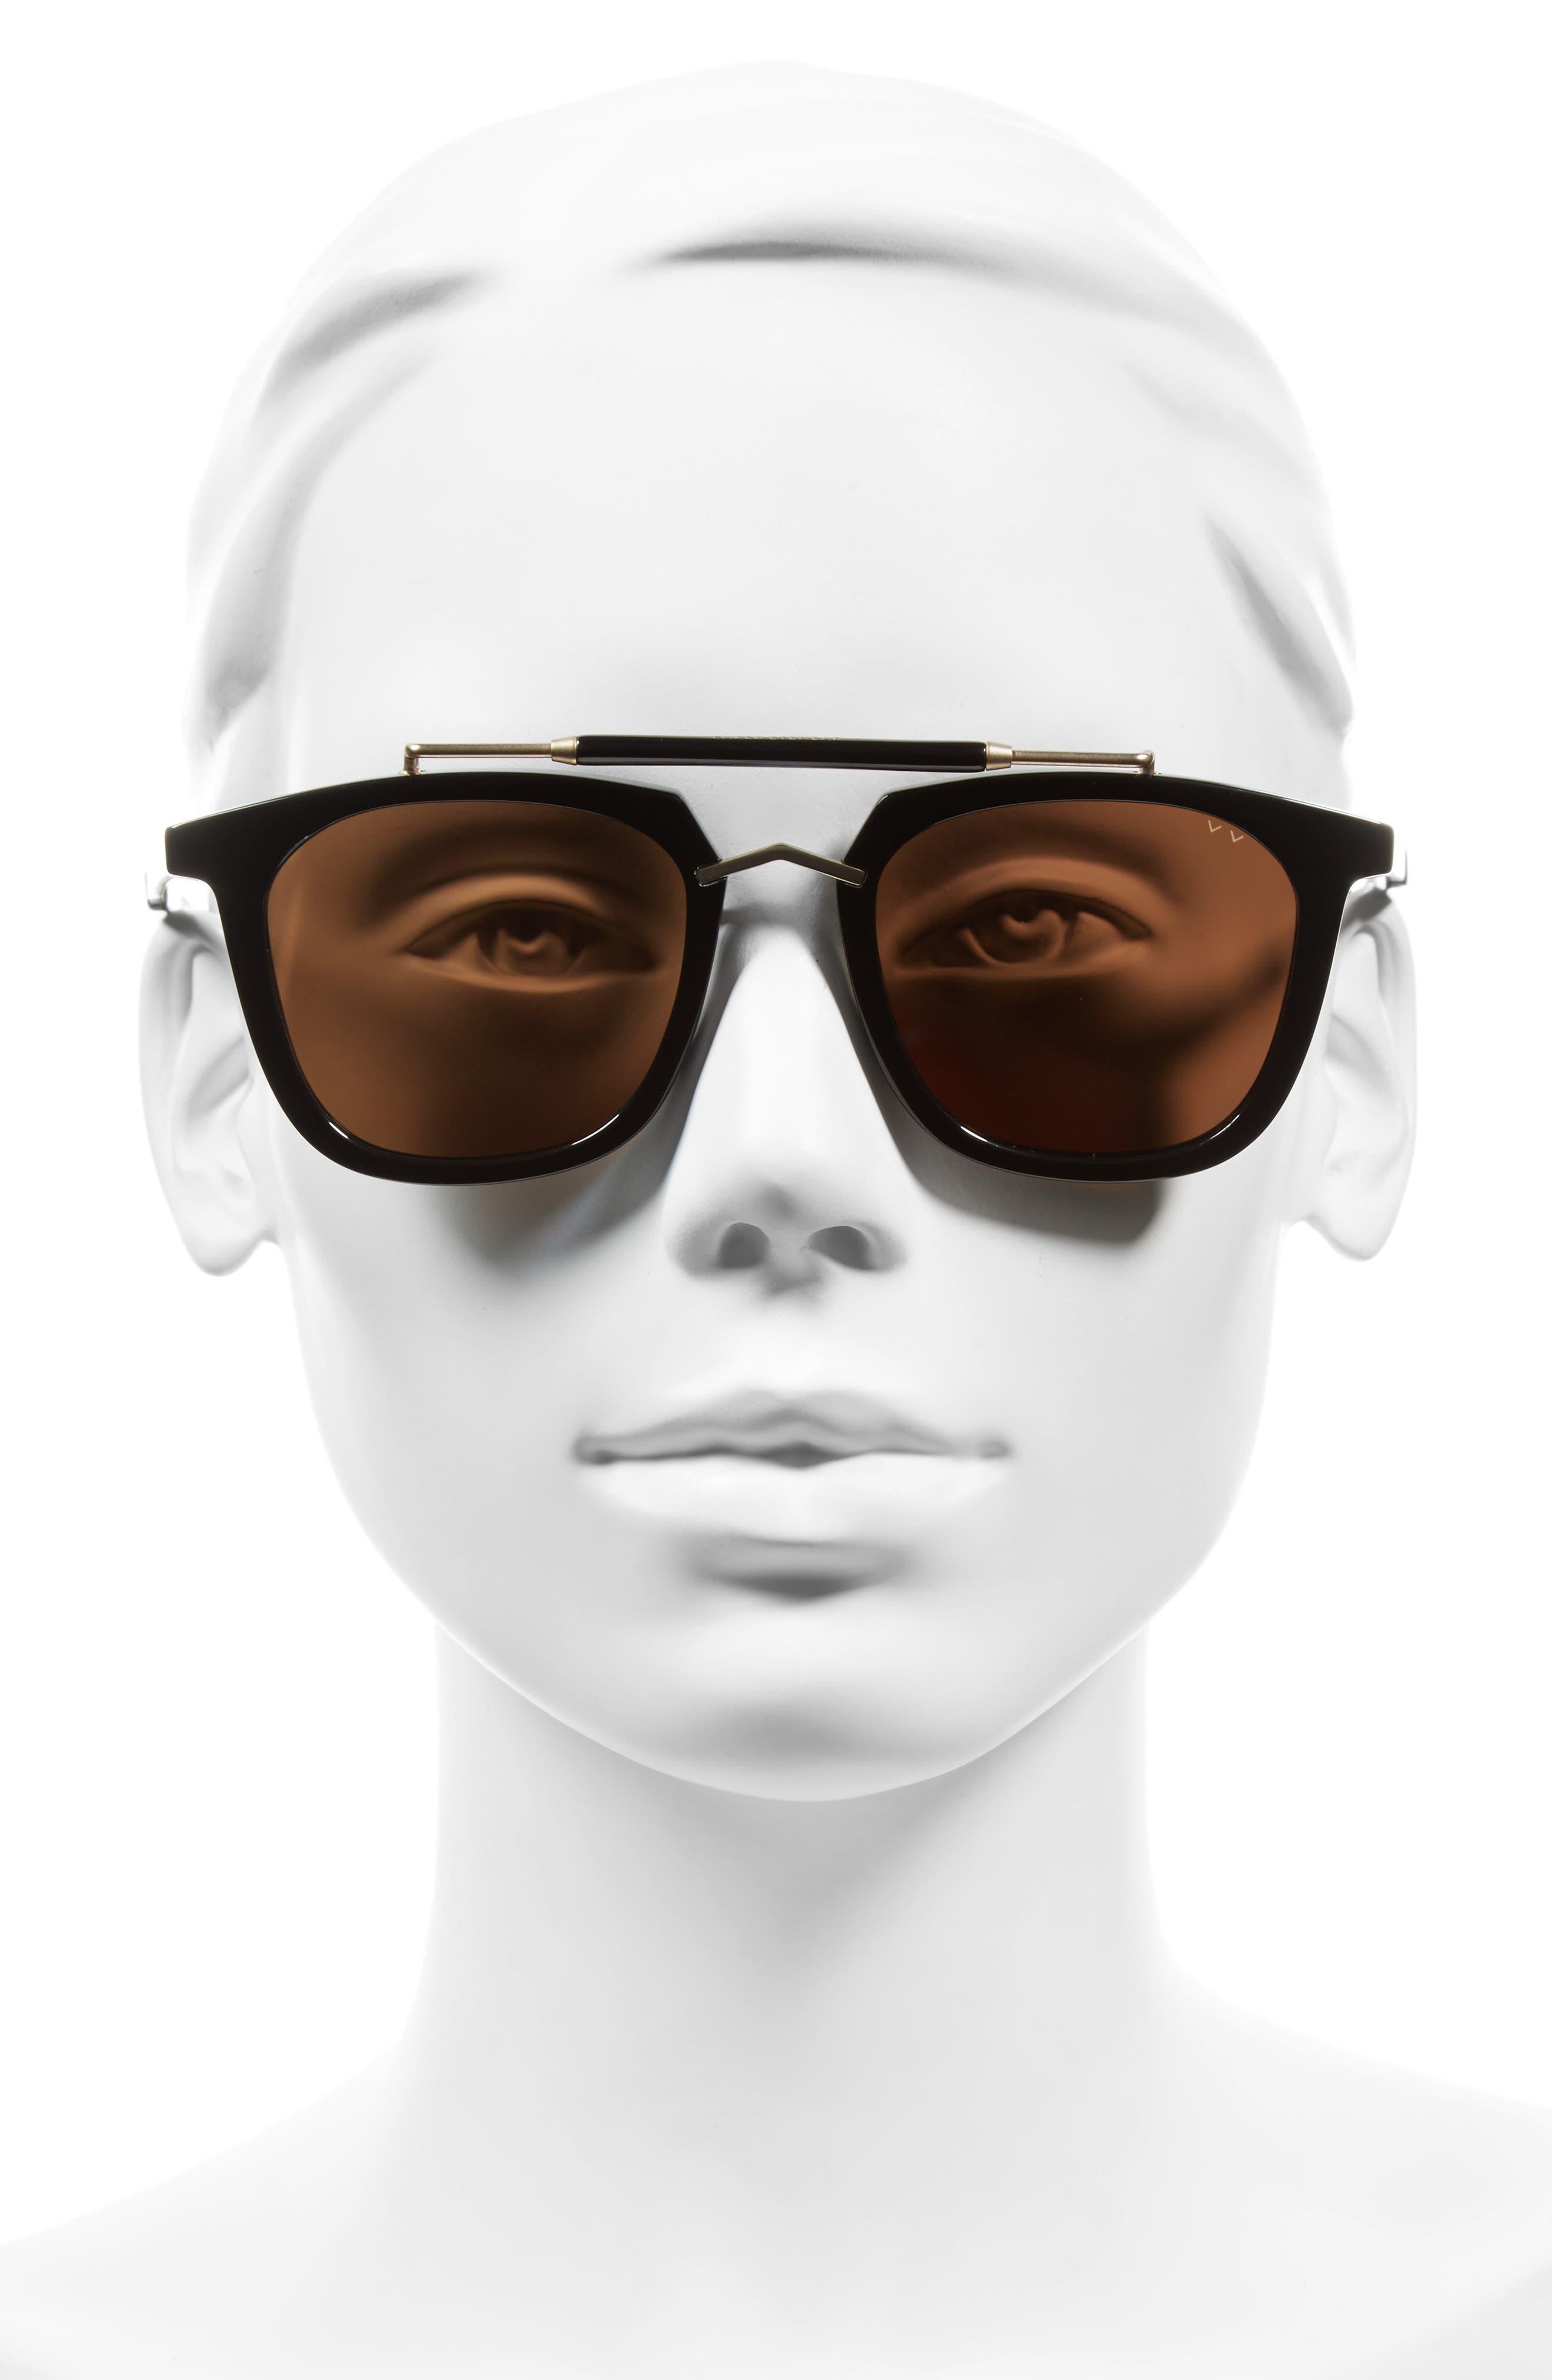 Camels & Caravans 50mm Retro Sunglasses,                             Alternate thumbnail 2, color,                             001